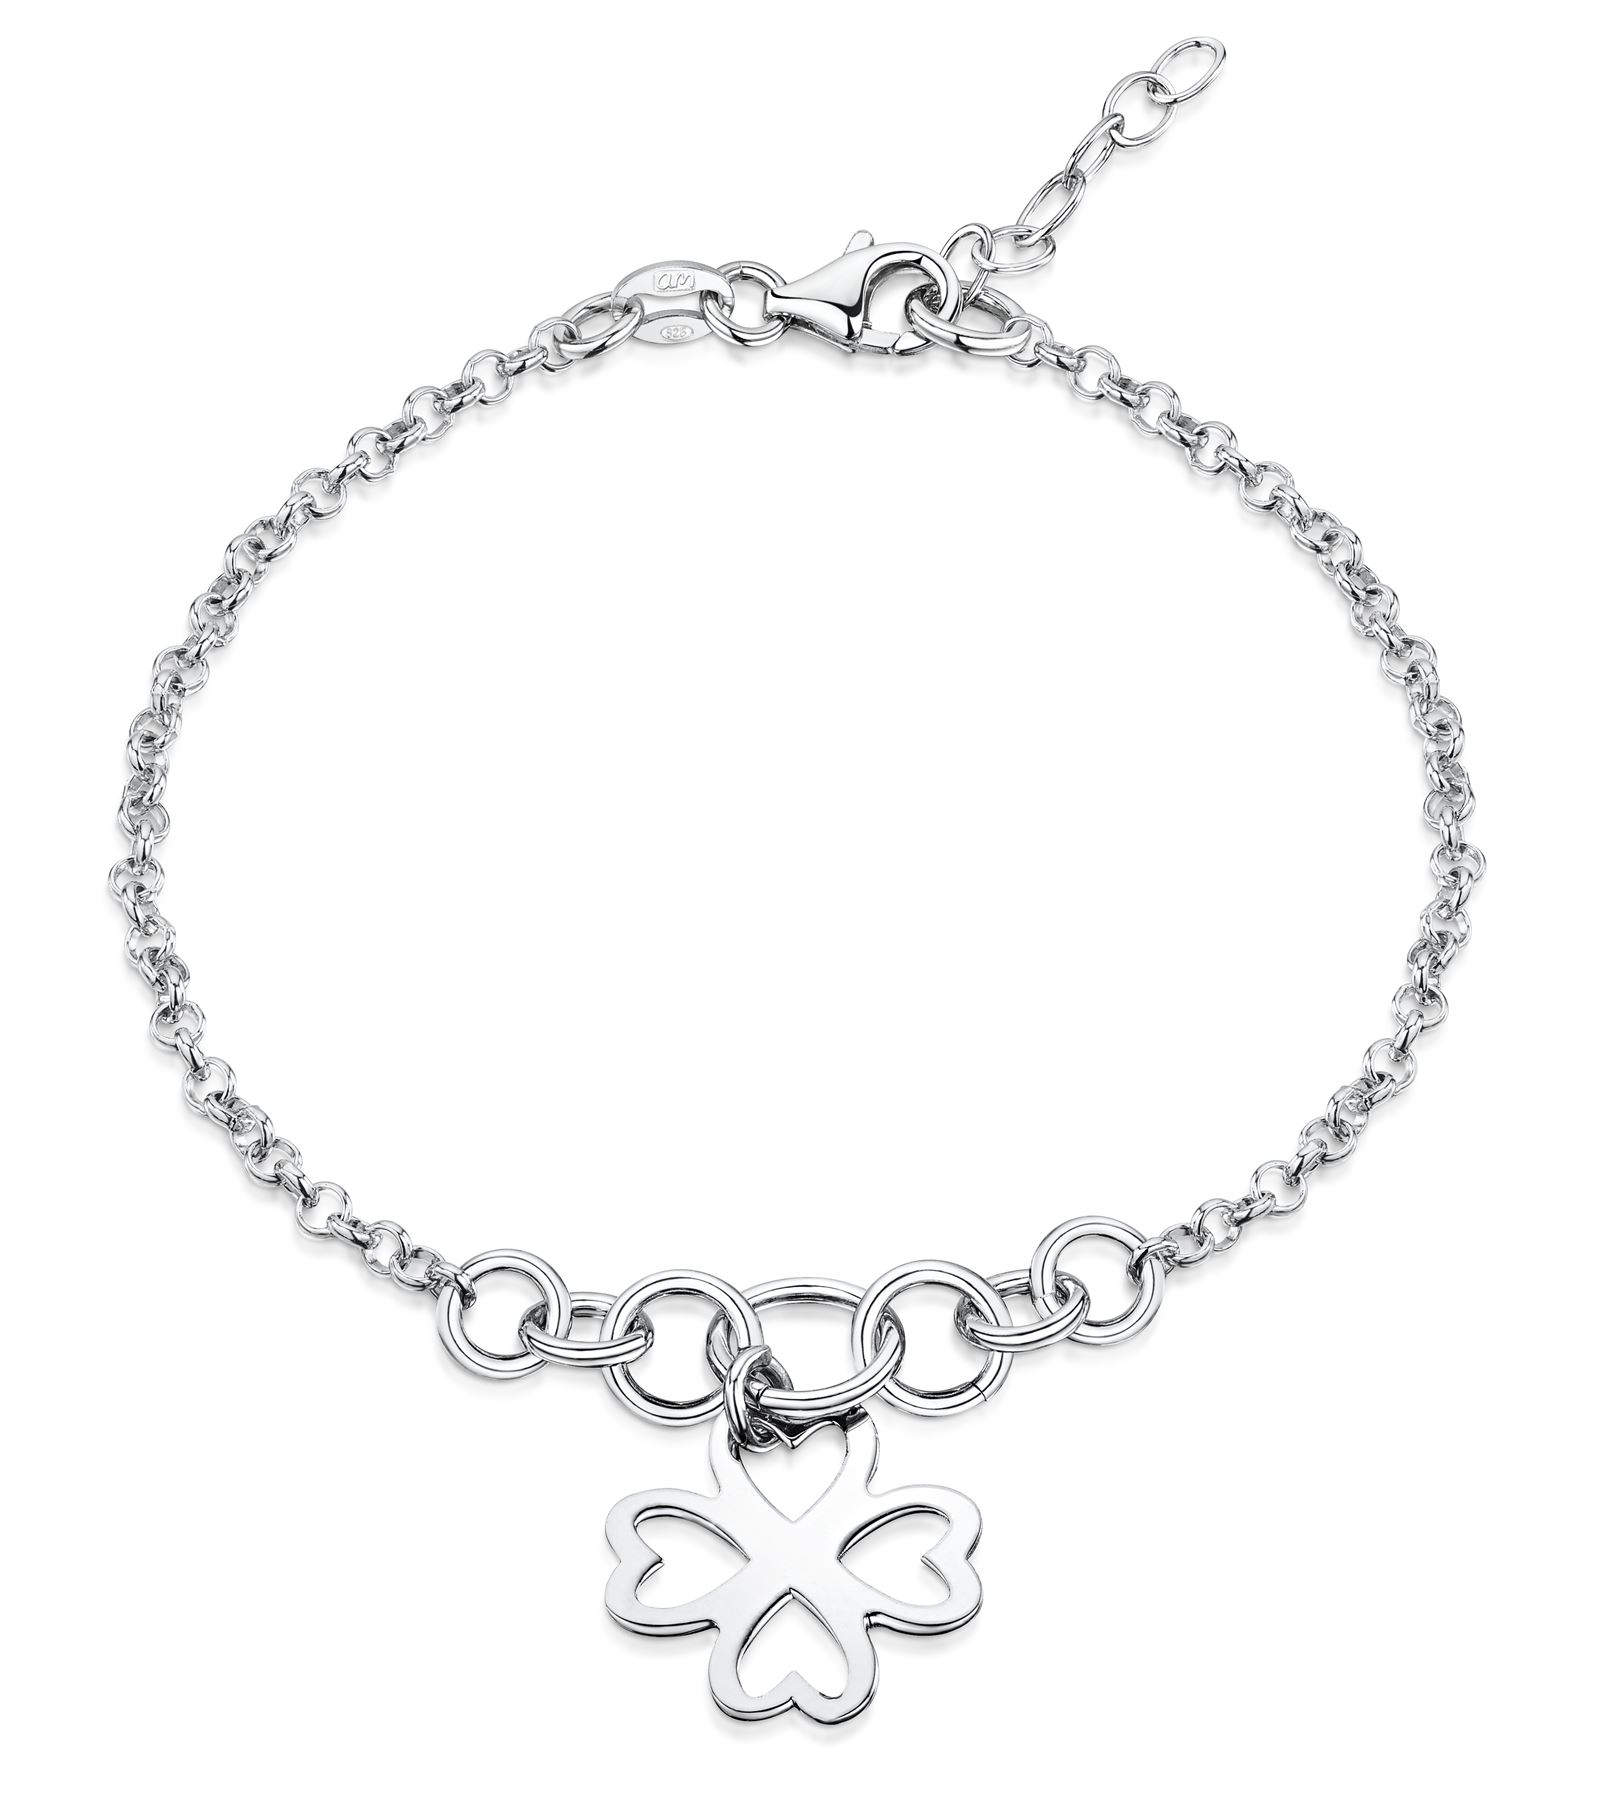 Amberta-Jewelry-925-Sterling-Silver-Adjustable-Bracelet-Italian-Bangle-for-Women thumbnail 71